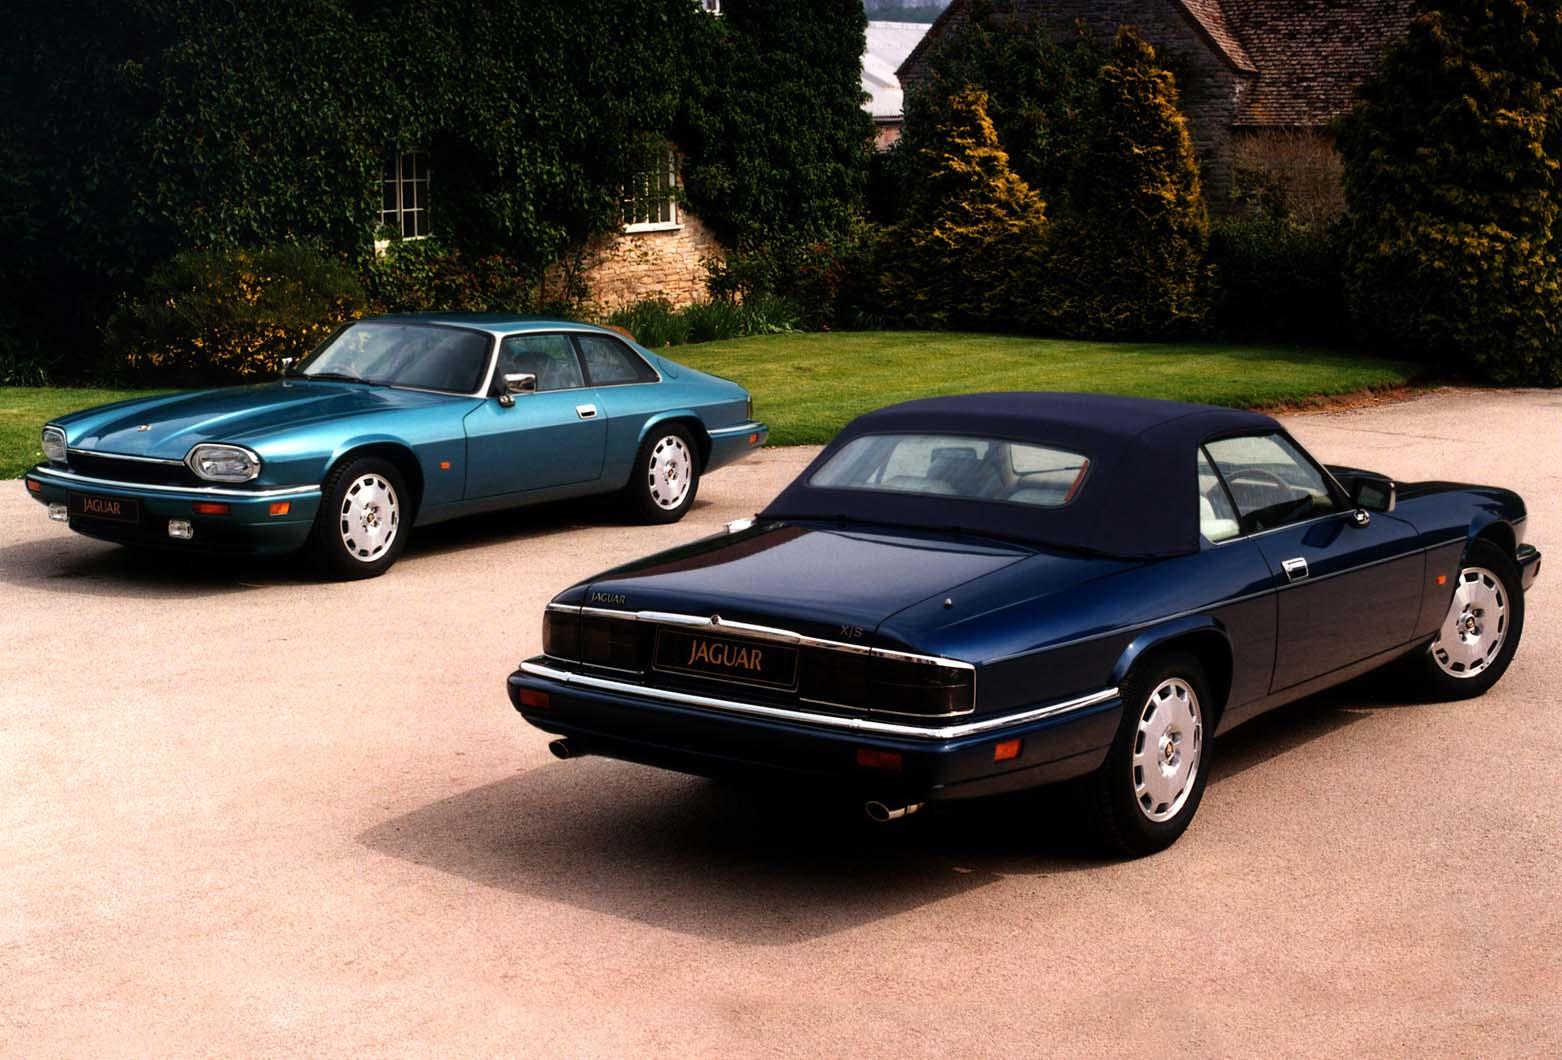 Find a used Jaguar XJS on PistonHeads